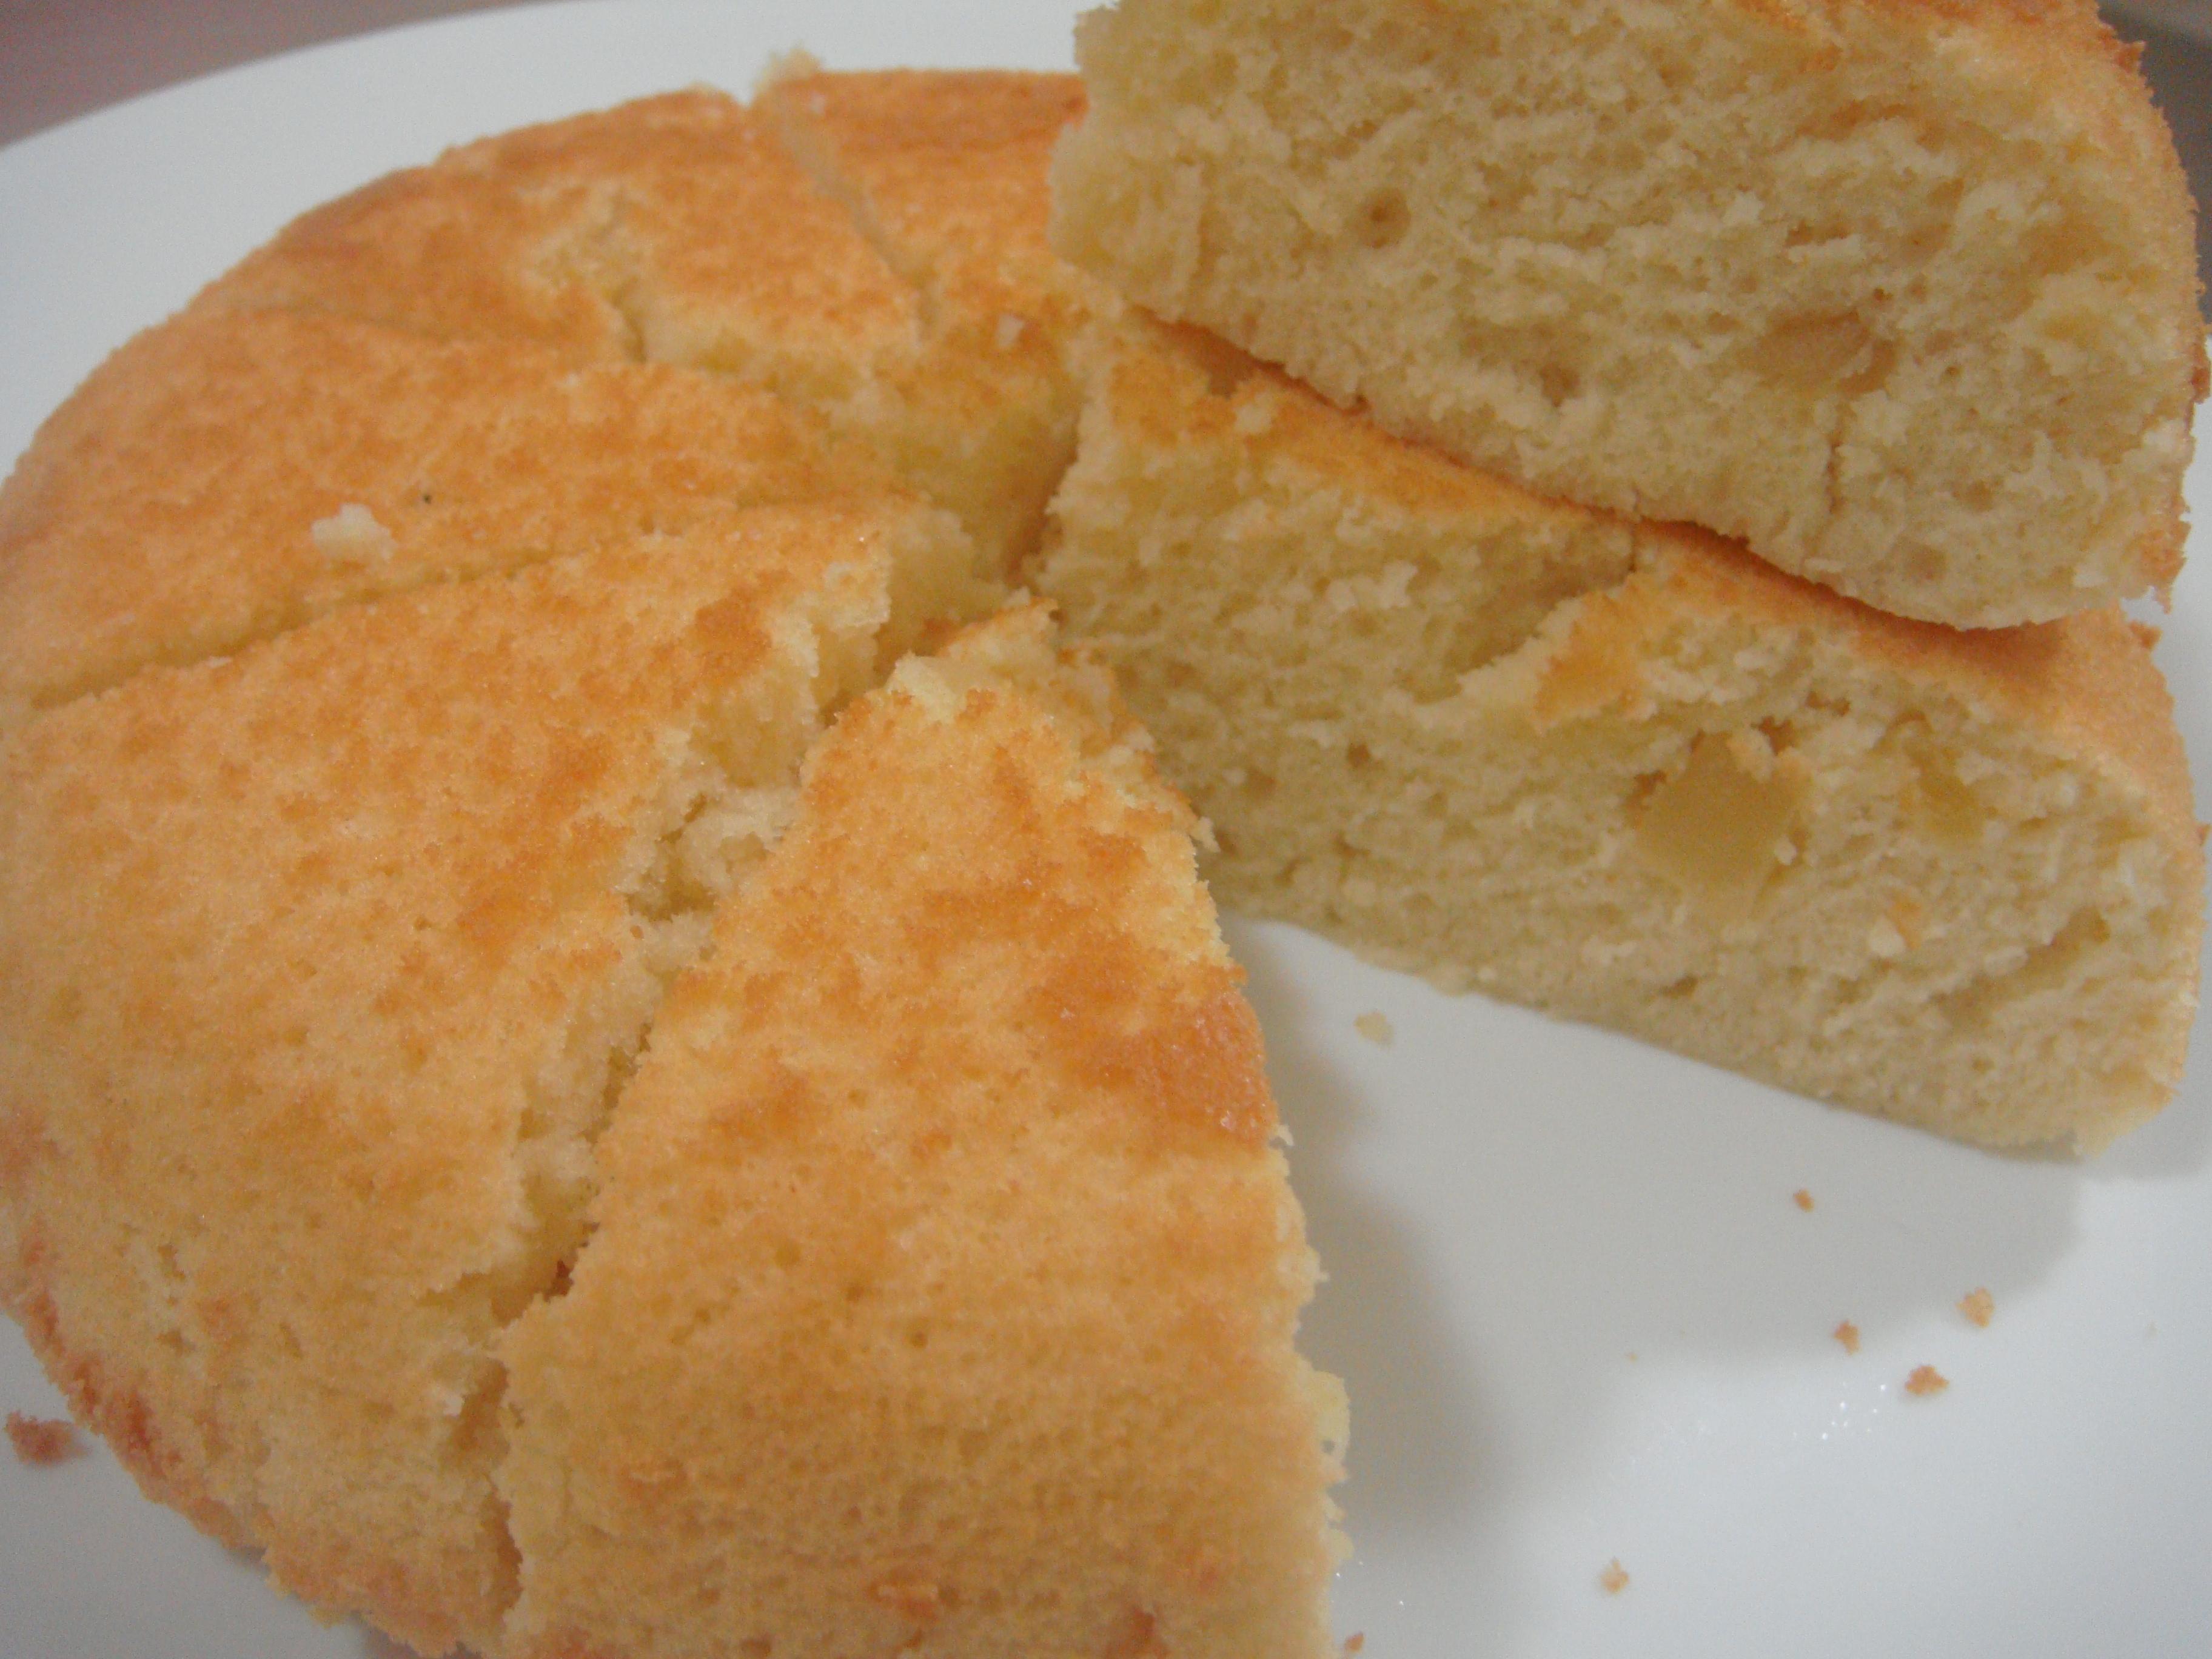 Yogurt Cake Recipe In Pressure Cooker: Yogurt Rice Cooker